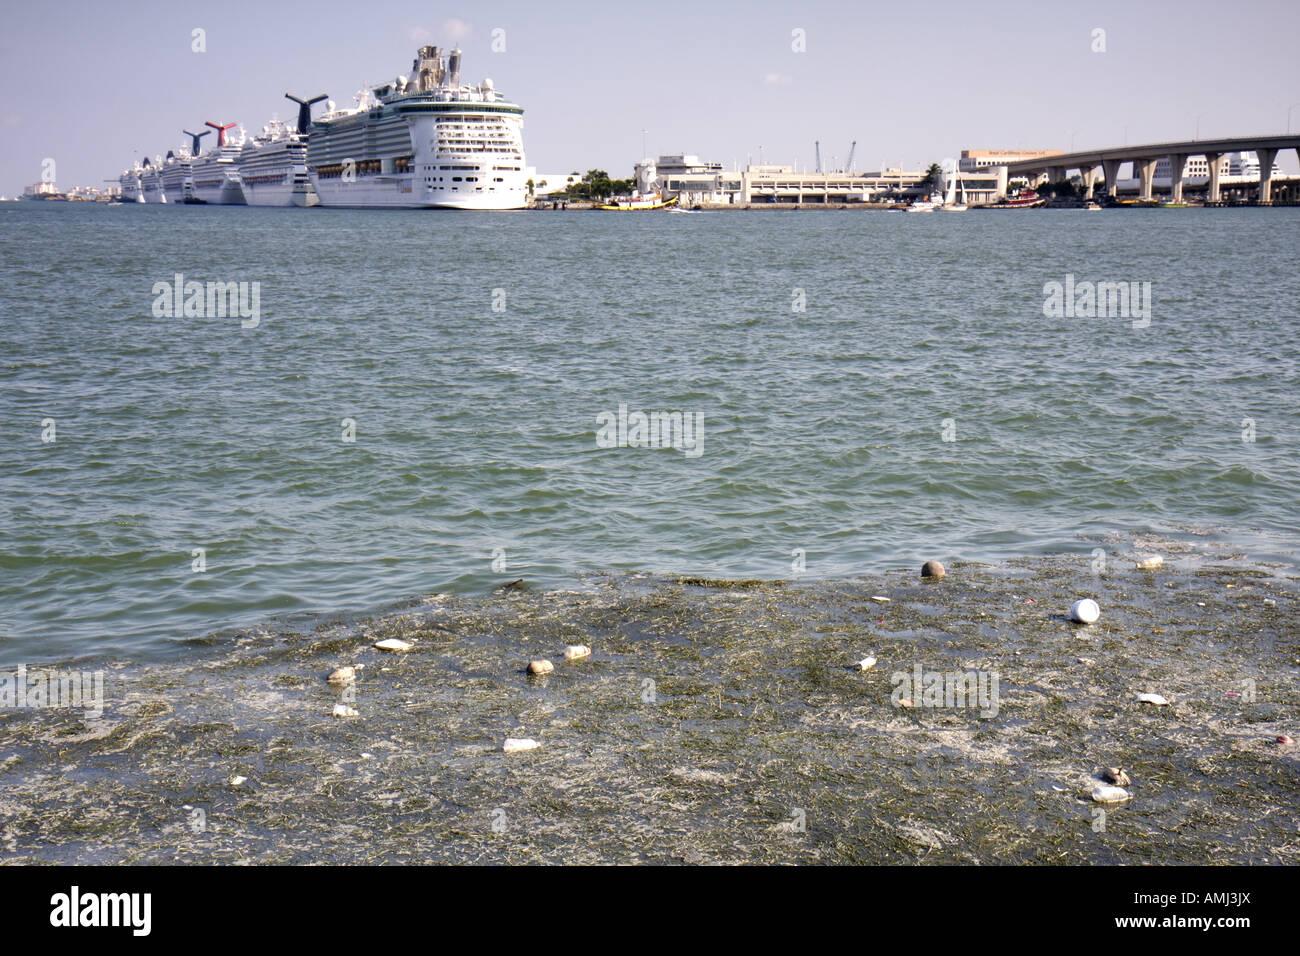 Miami Florida Biscayne Bay Cruise Ships Port Of Miami Polluted - Cruise ship port in miami